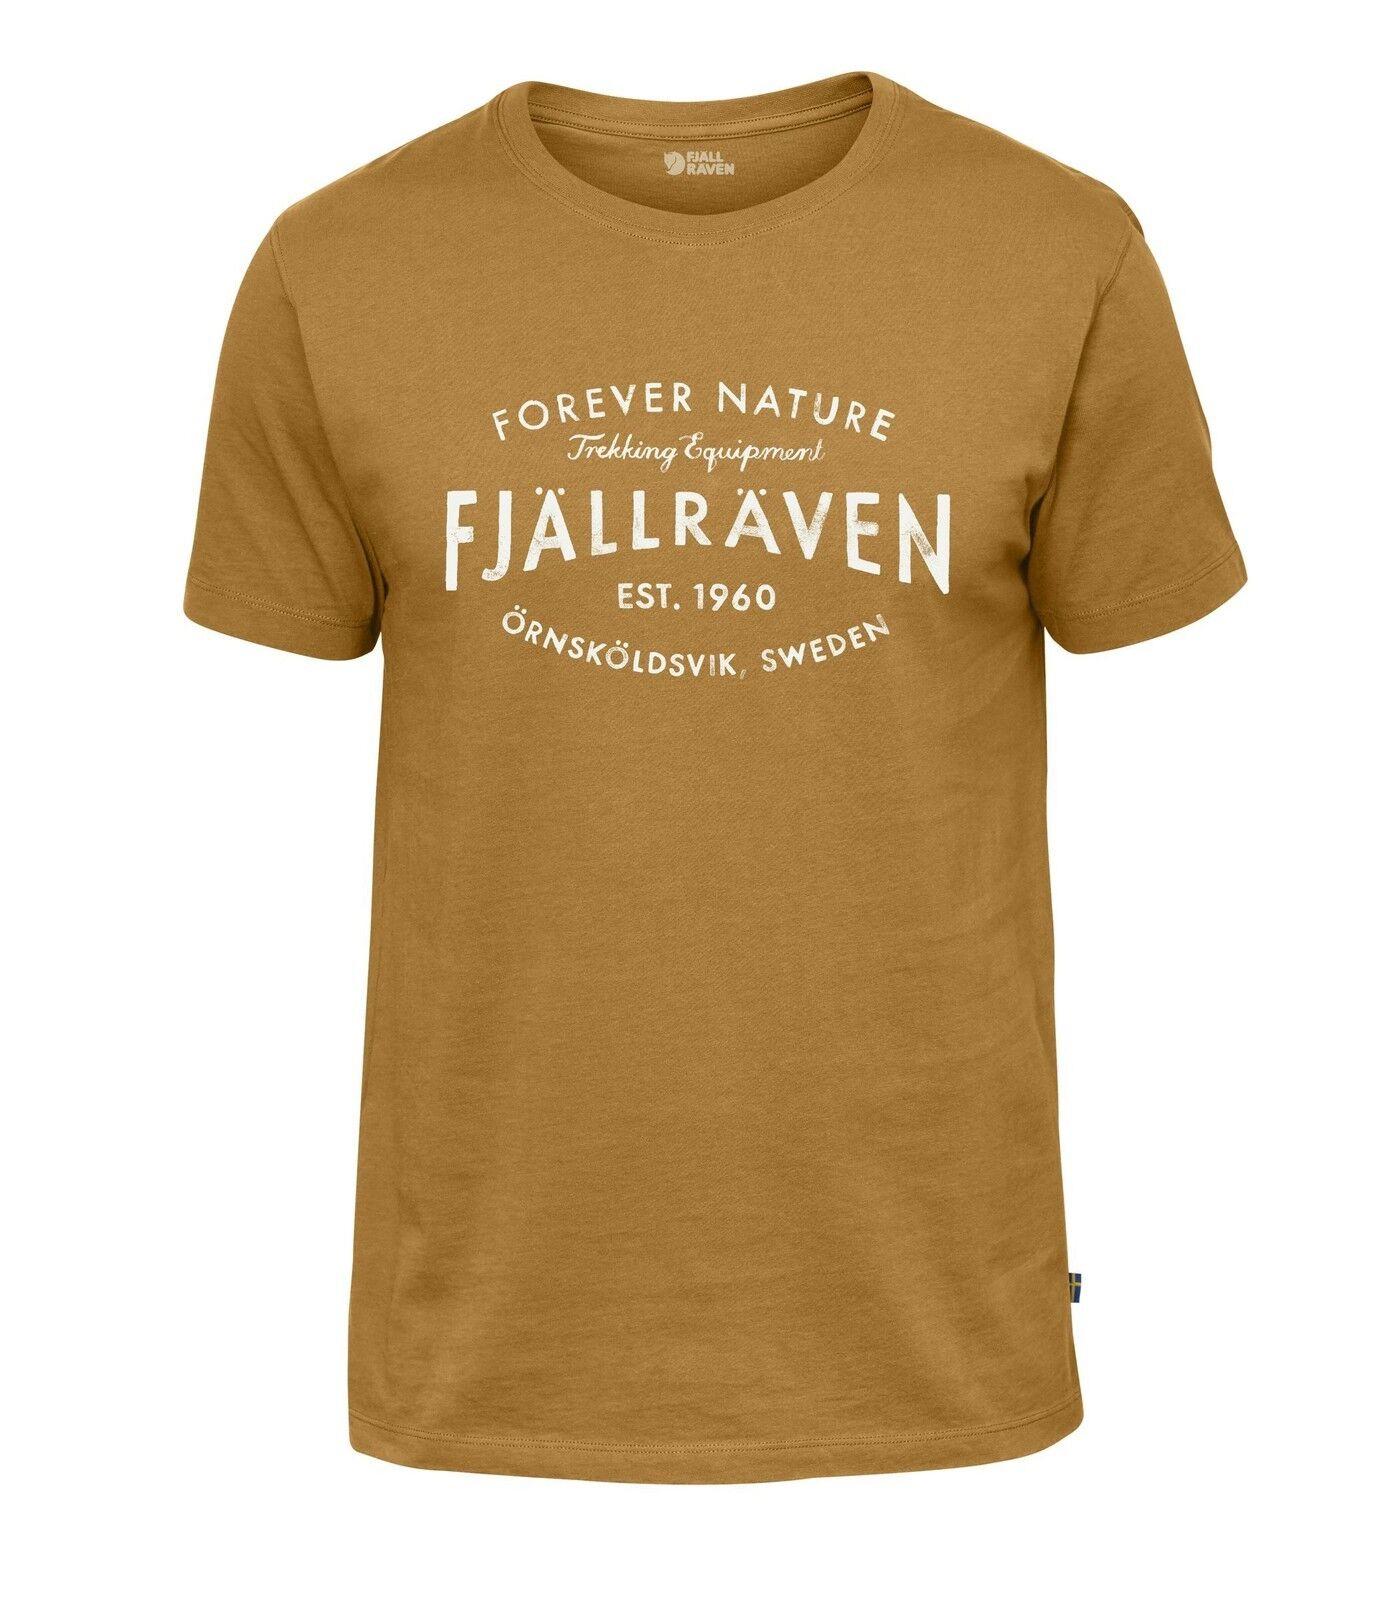 Fjäll Räven Est. 1960 T-Shirt M 81946 Gr. L Acorn